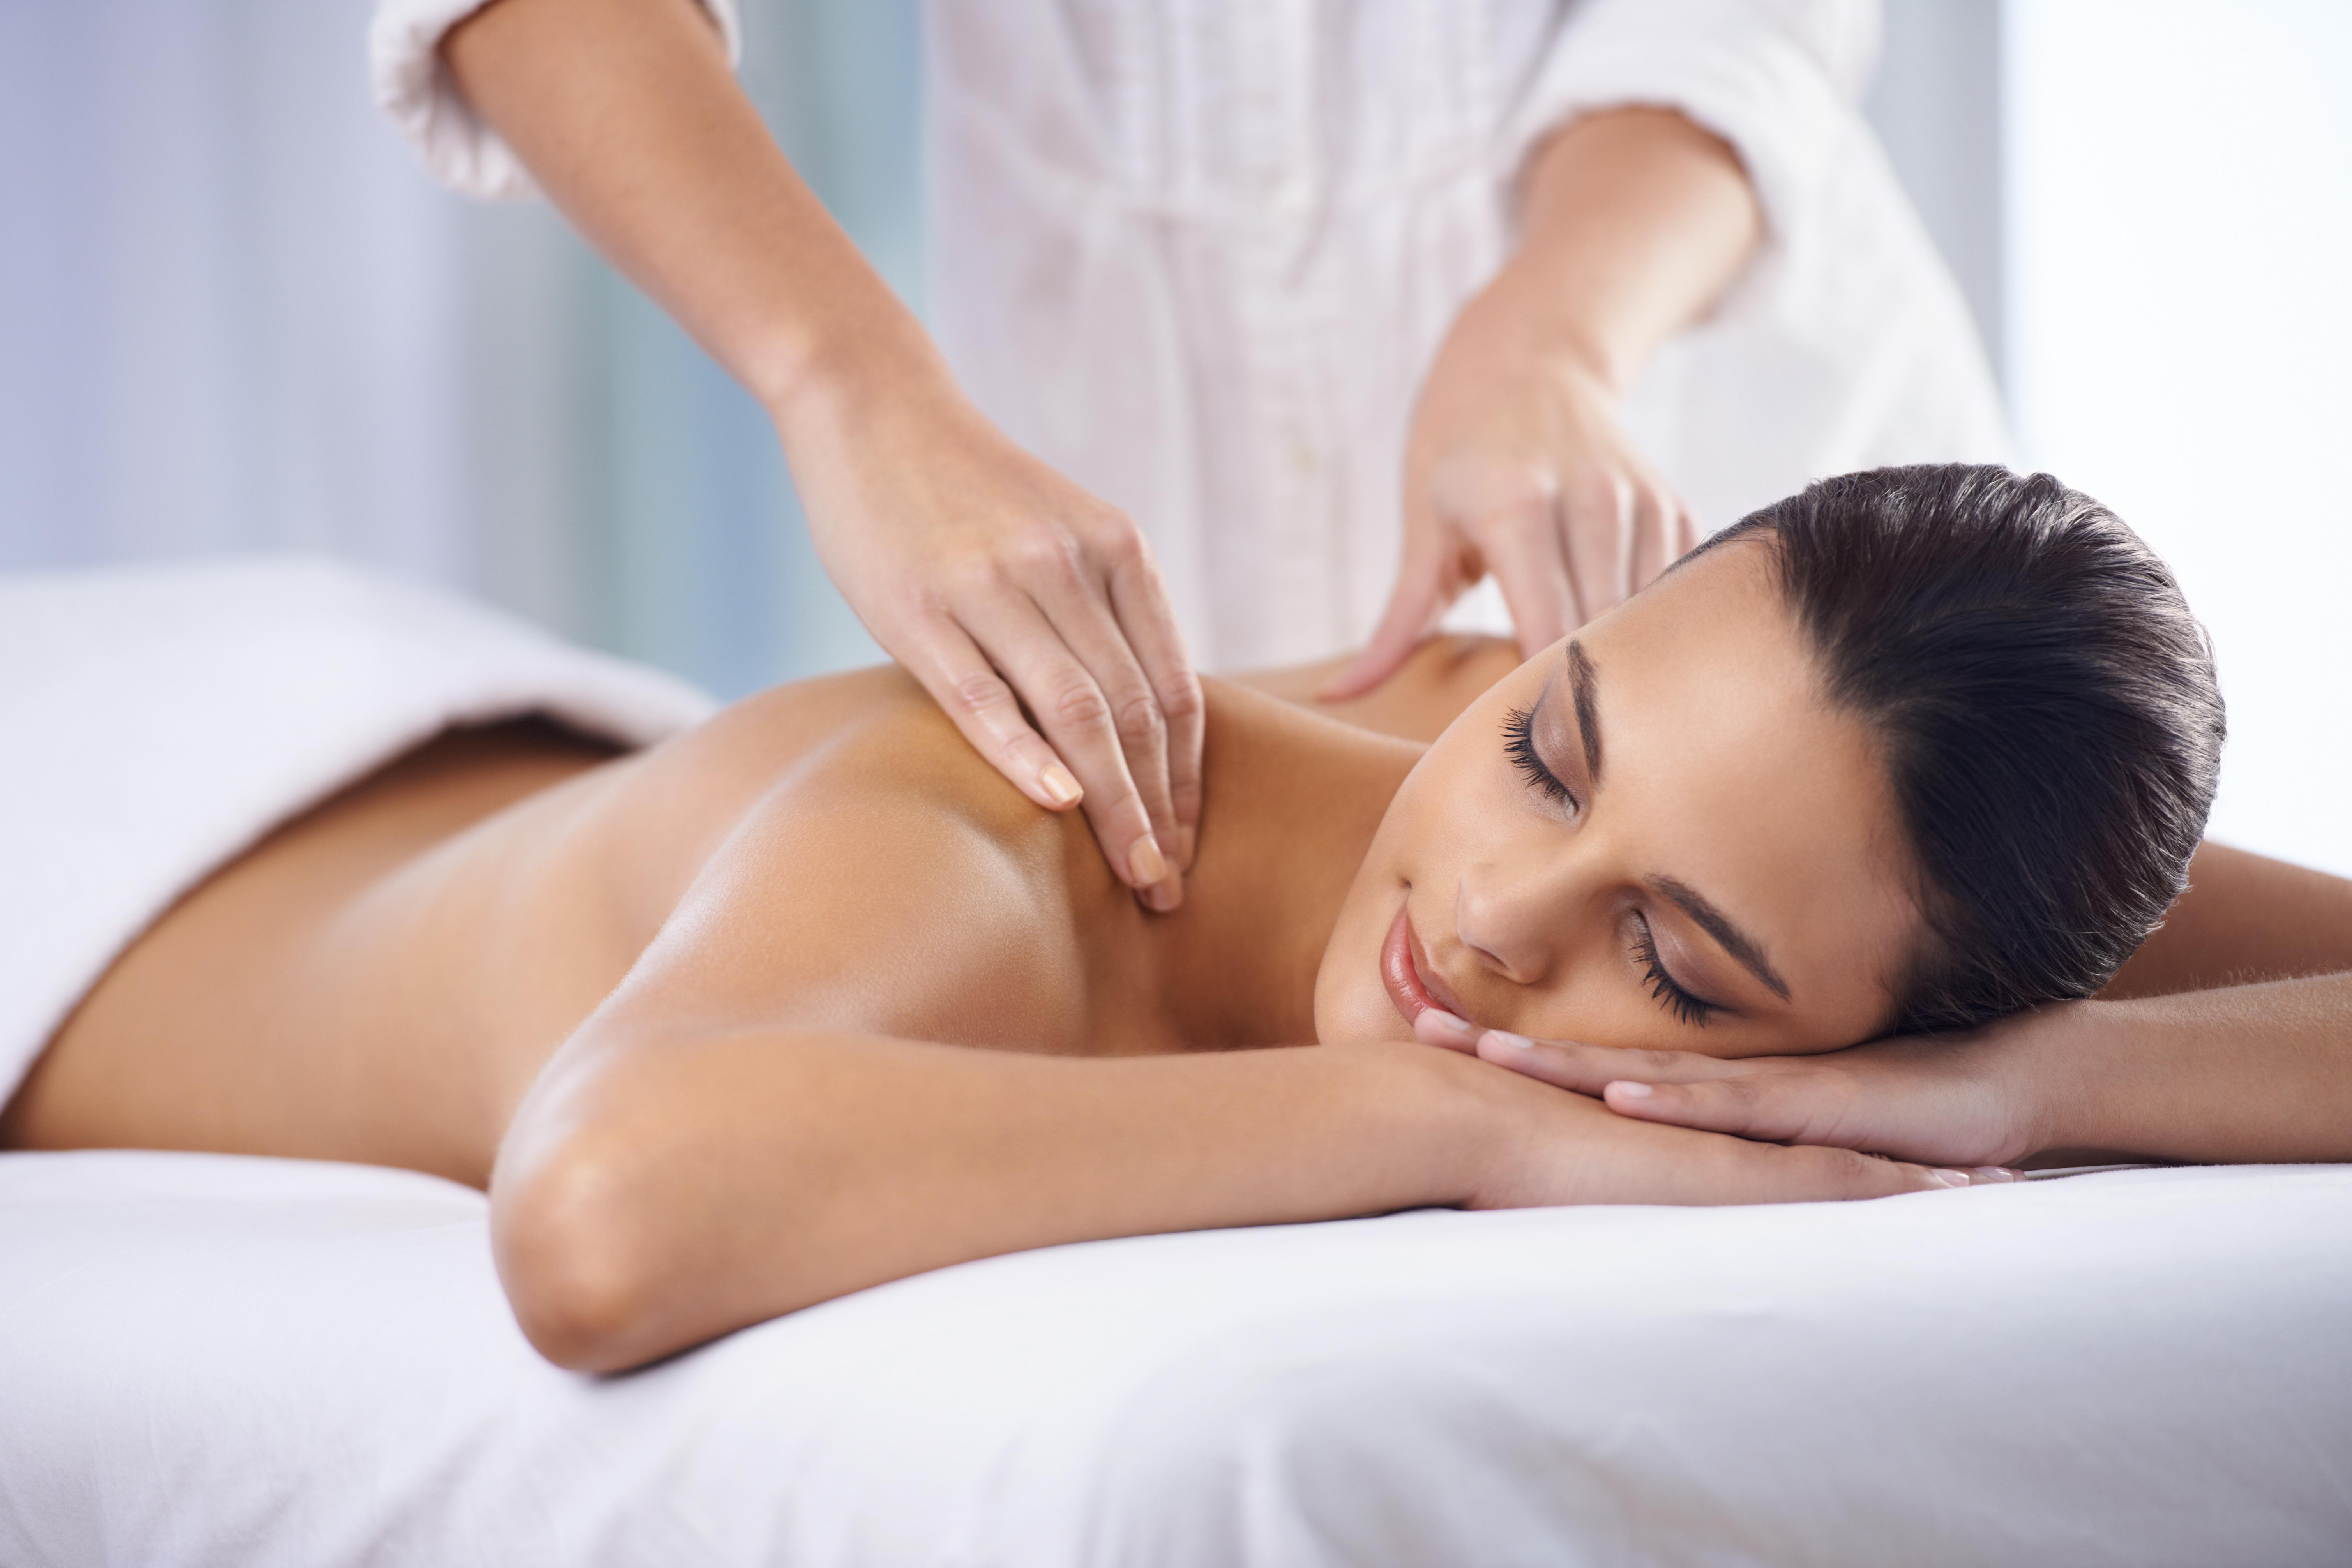 Masajes reductores, masajes anticeluliticos y masajes relajantes en SantaMonica Aesthetics Badajoz